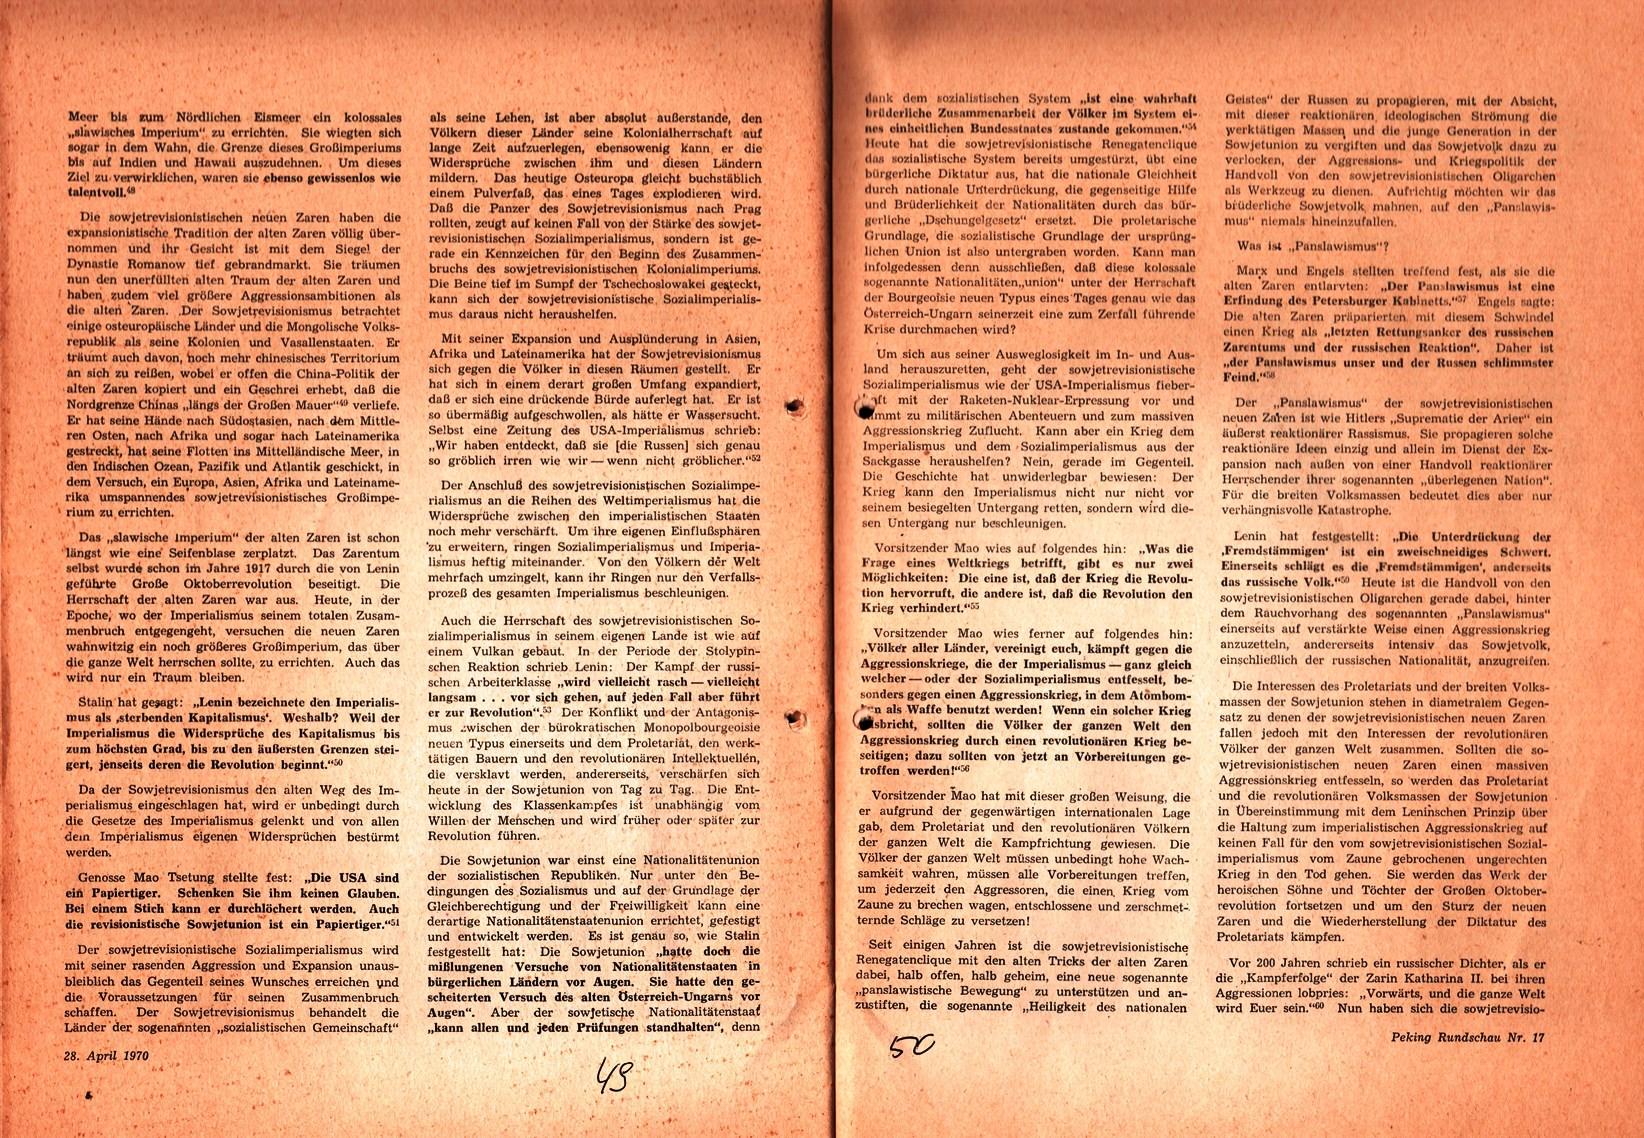 KSV_1974_Materialien_zur_Programmdiskussion_01_026